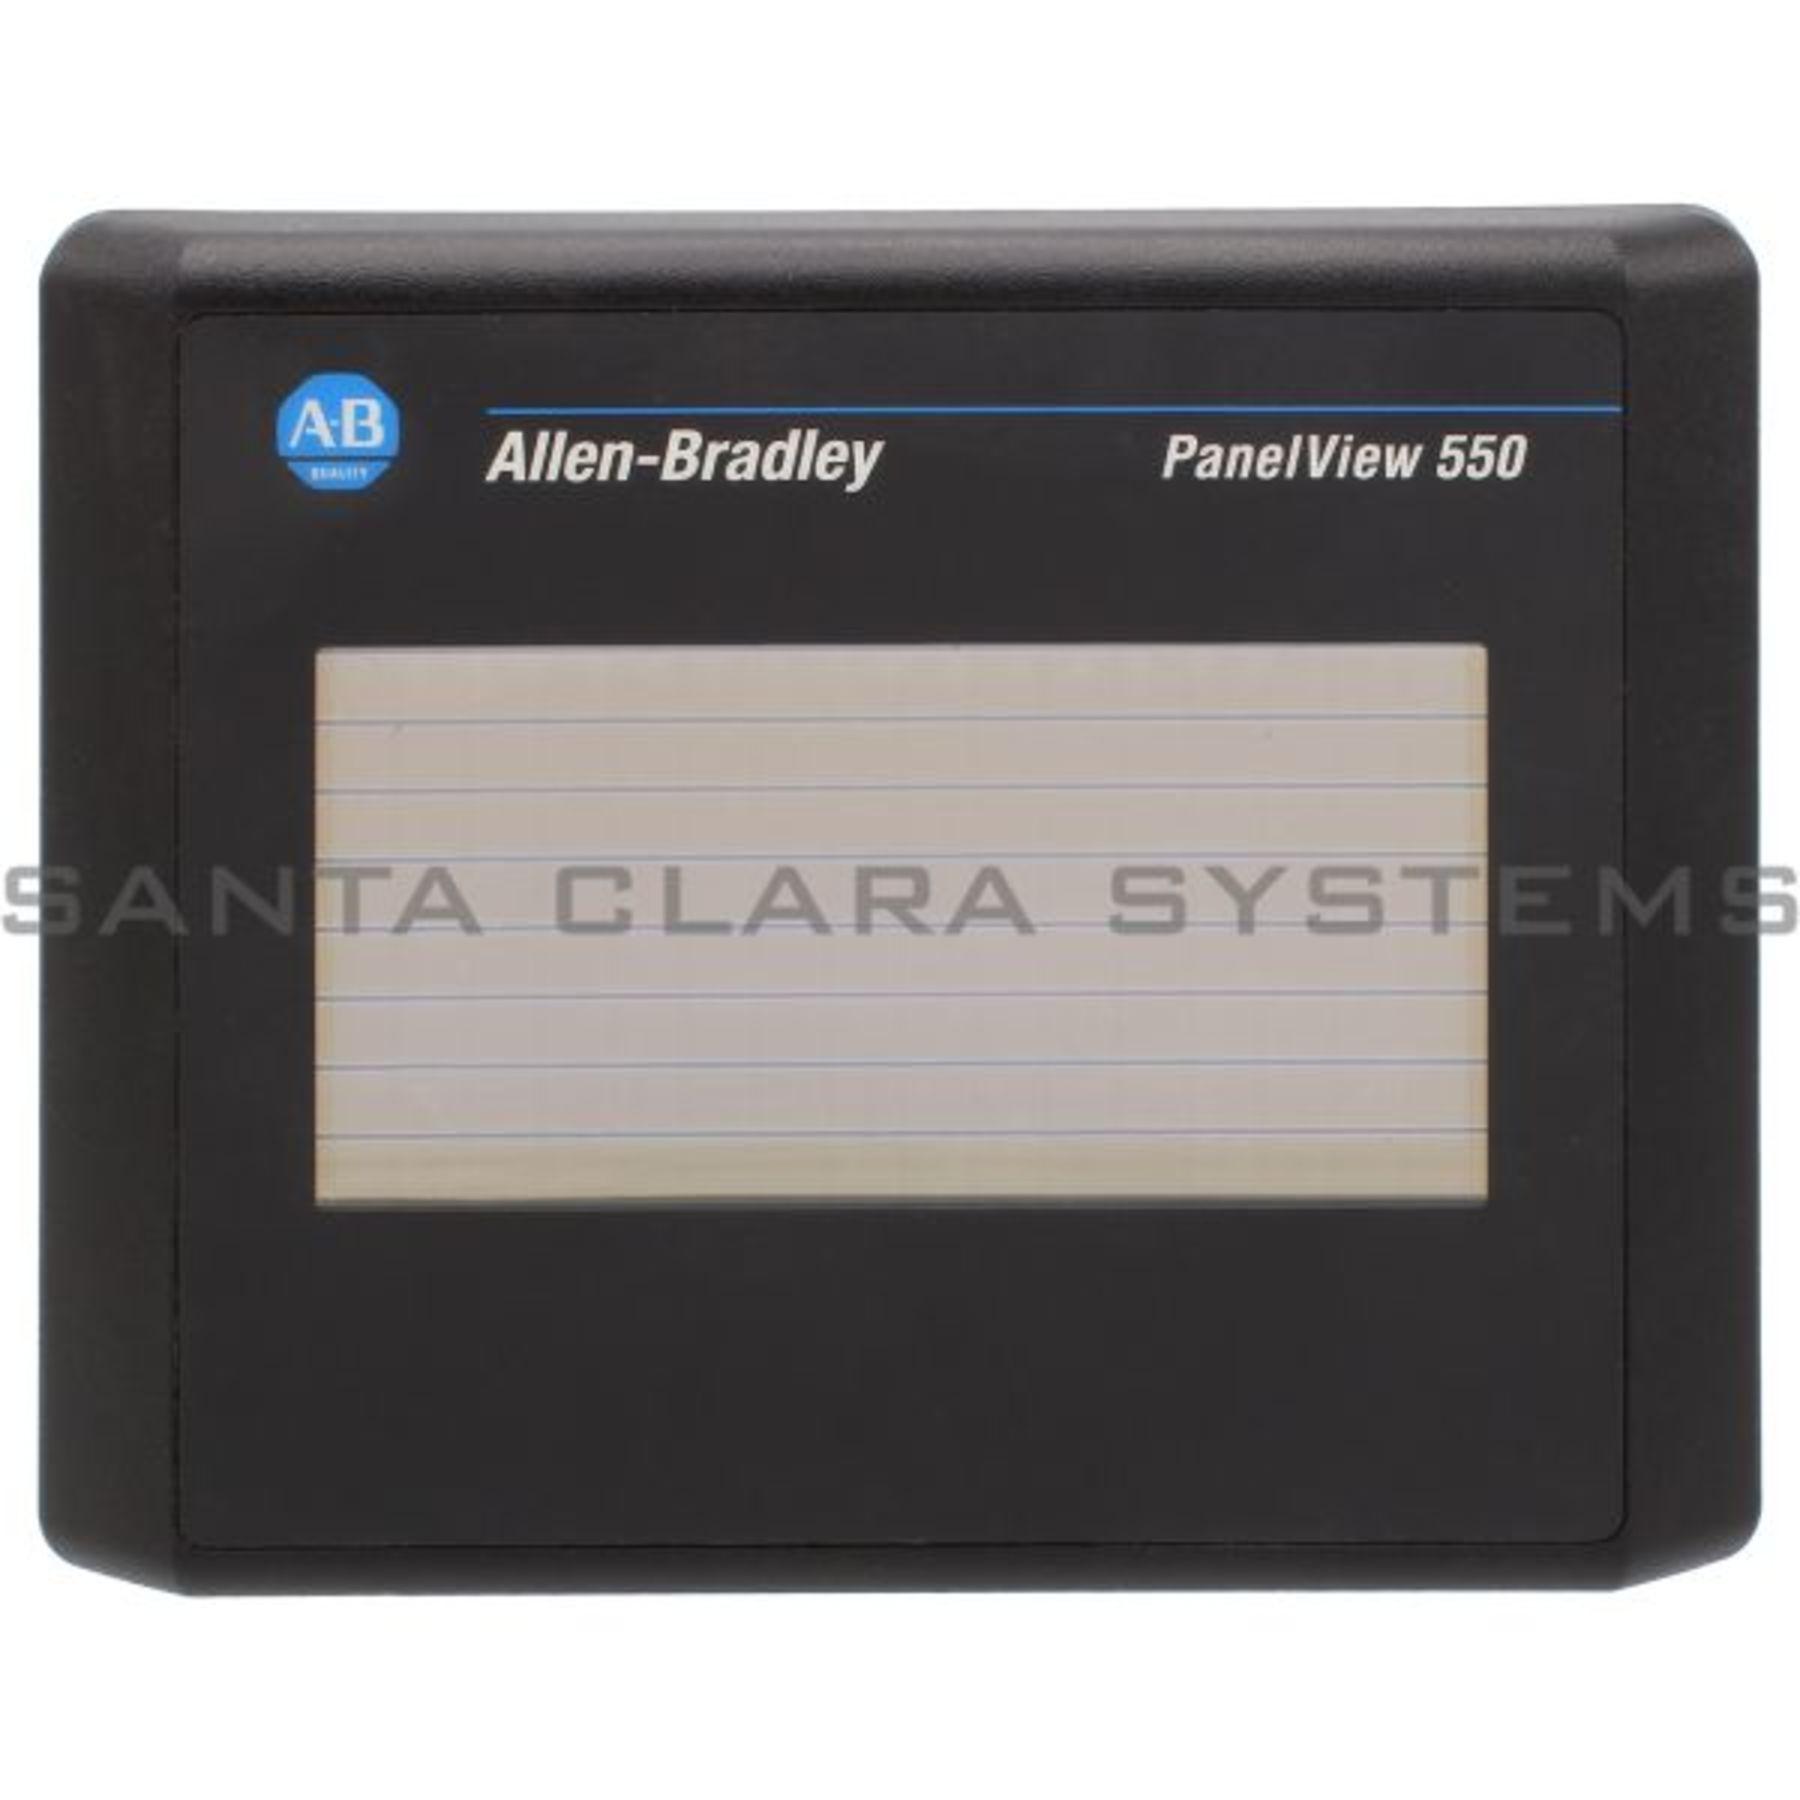 Allen Bradley 2711-T5A15L1 PanelView 550 Product Image